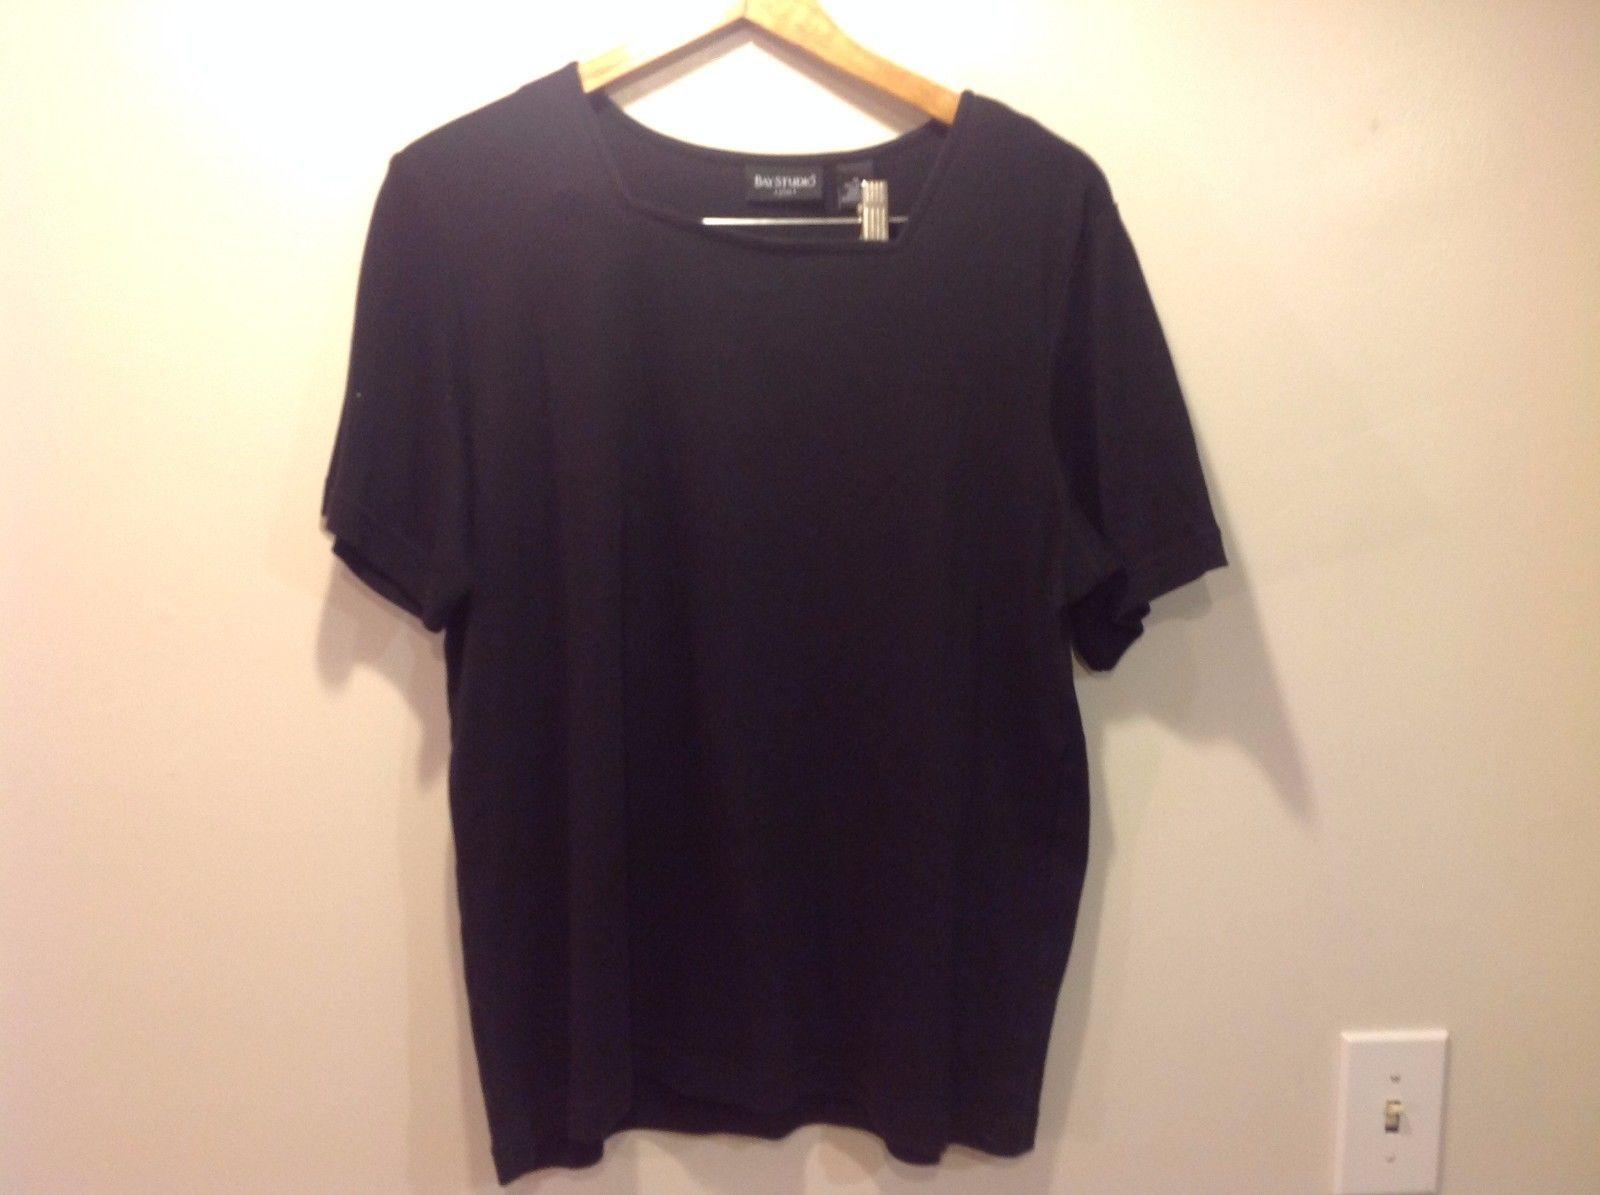 Bay Studio Black Short Sleeve Dance Style Cut Shirt Cotton Size 1x